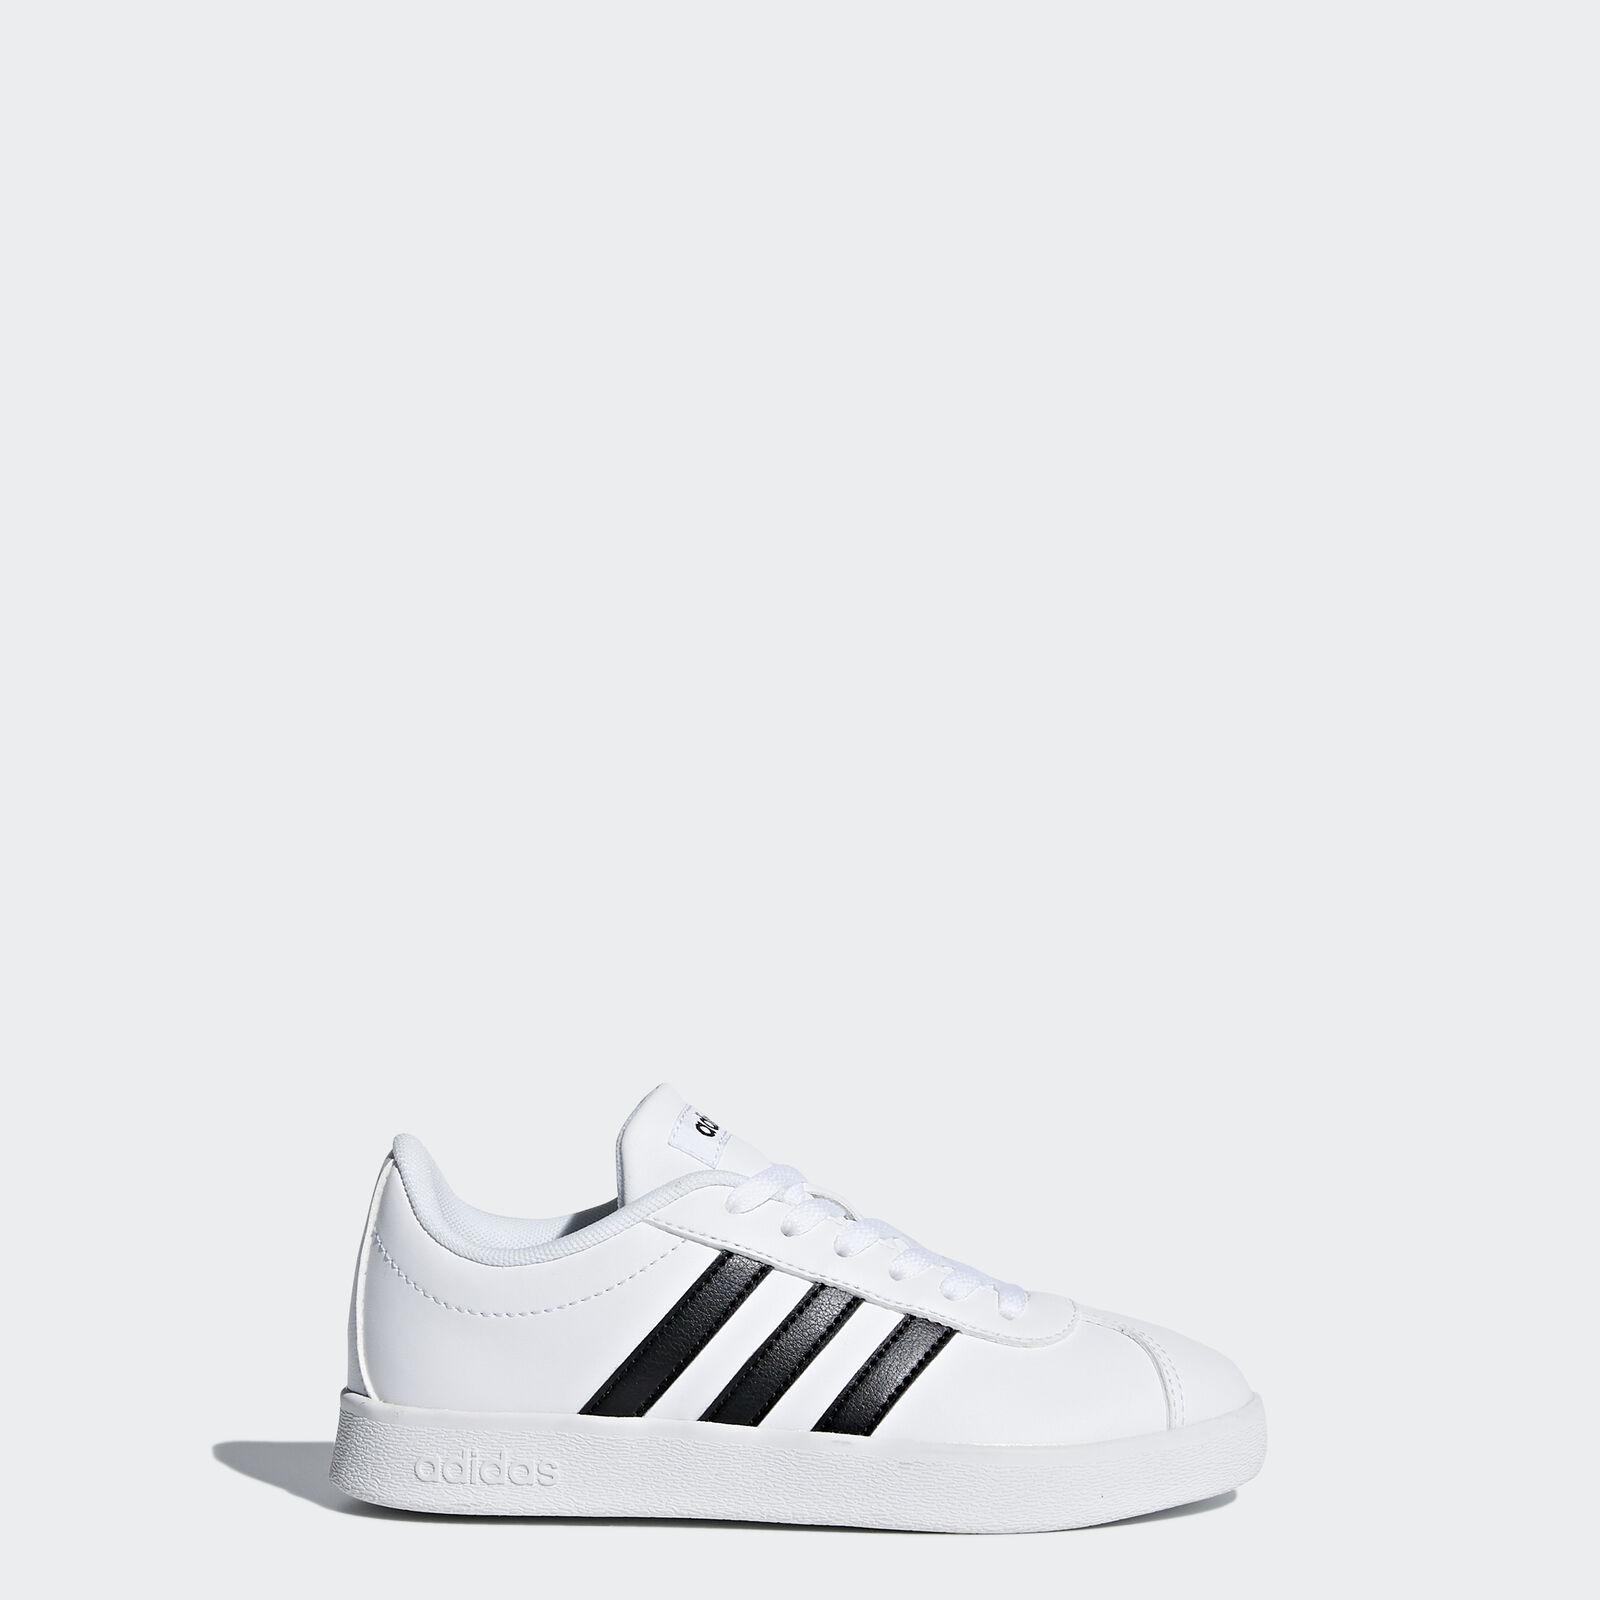 adidas Vl Court kids Unisex Sneakers, Black - FBV41